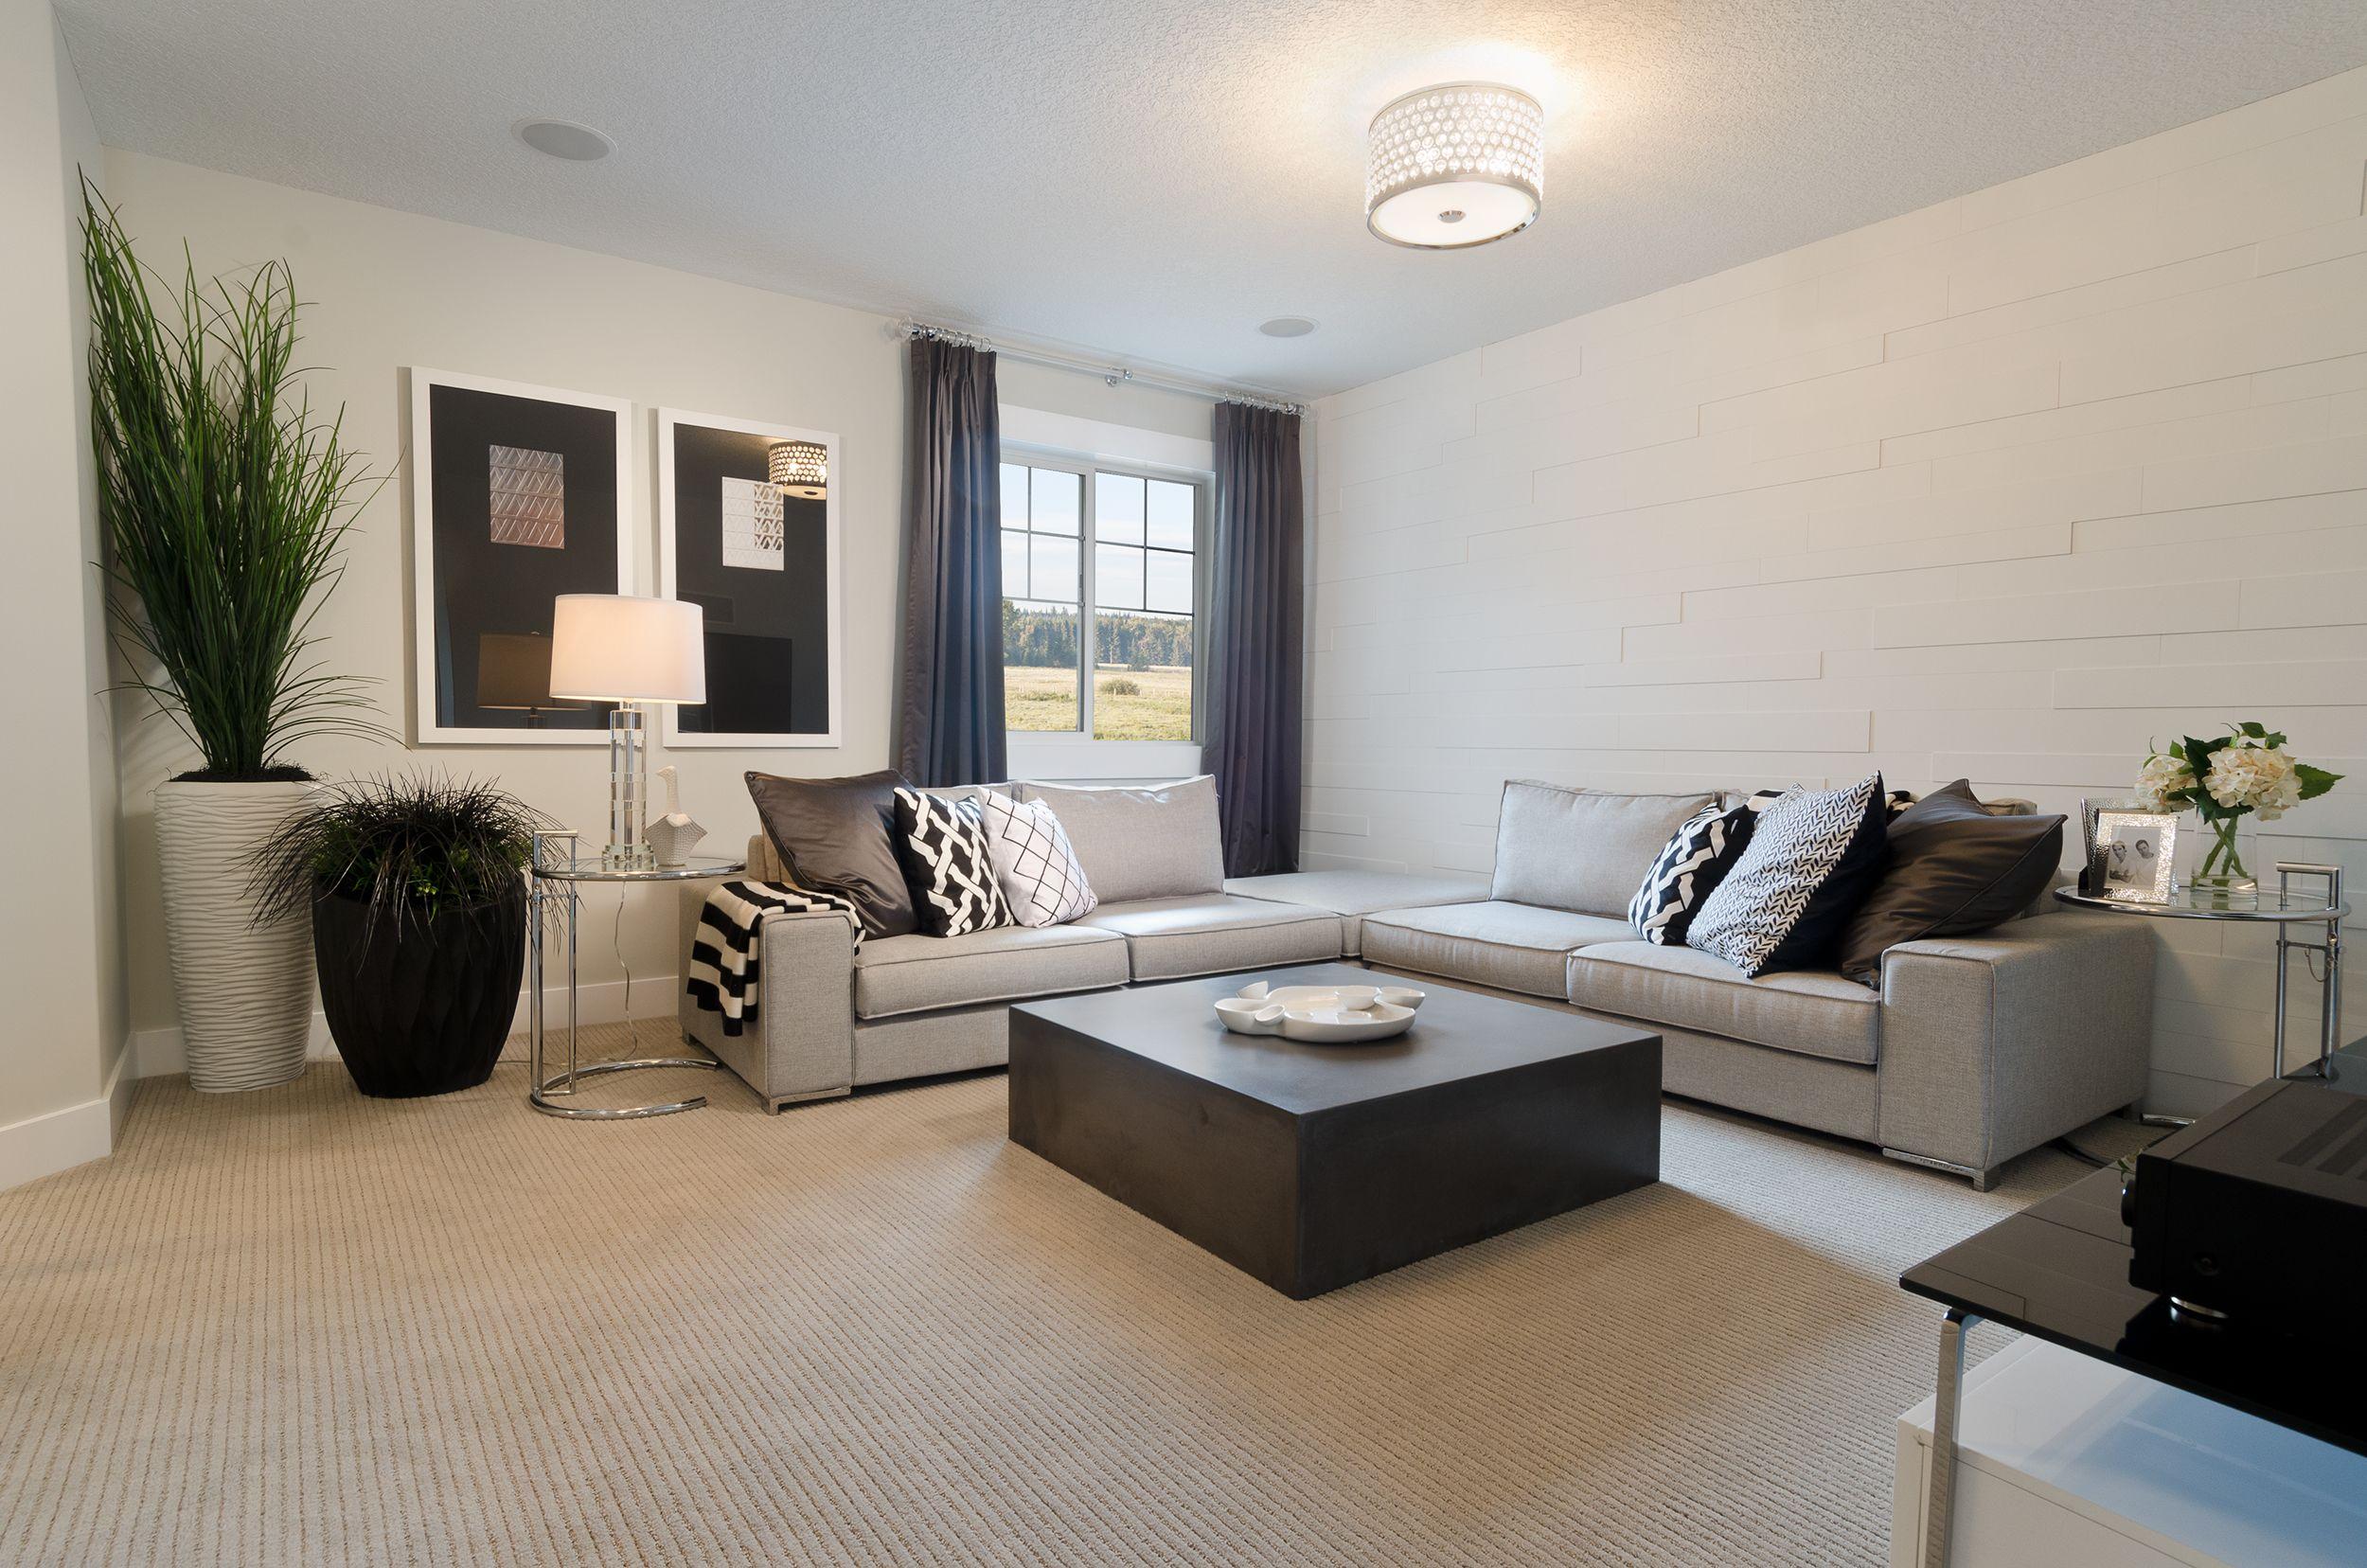 Light Grey Sofa With Dark Carpet Alstons Bedroom Furniture Bonus Room Of The Everett Showhome In Nolan Hill